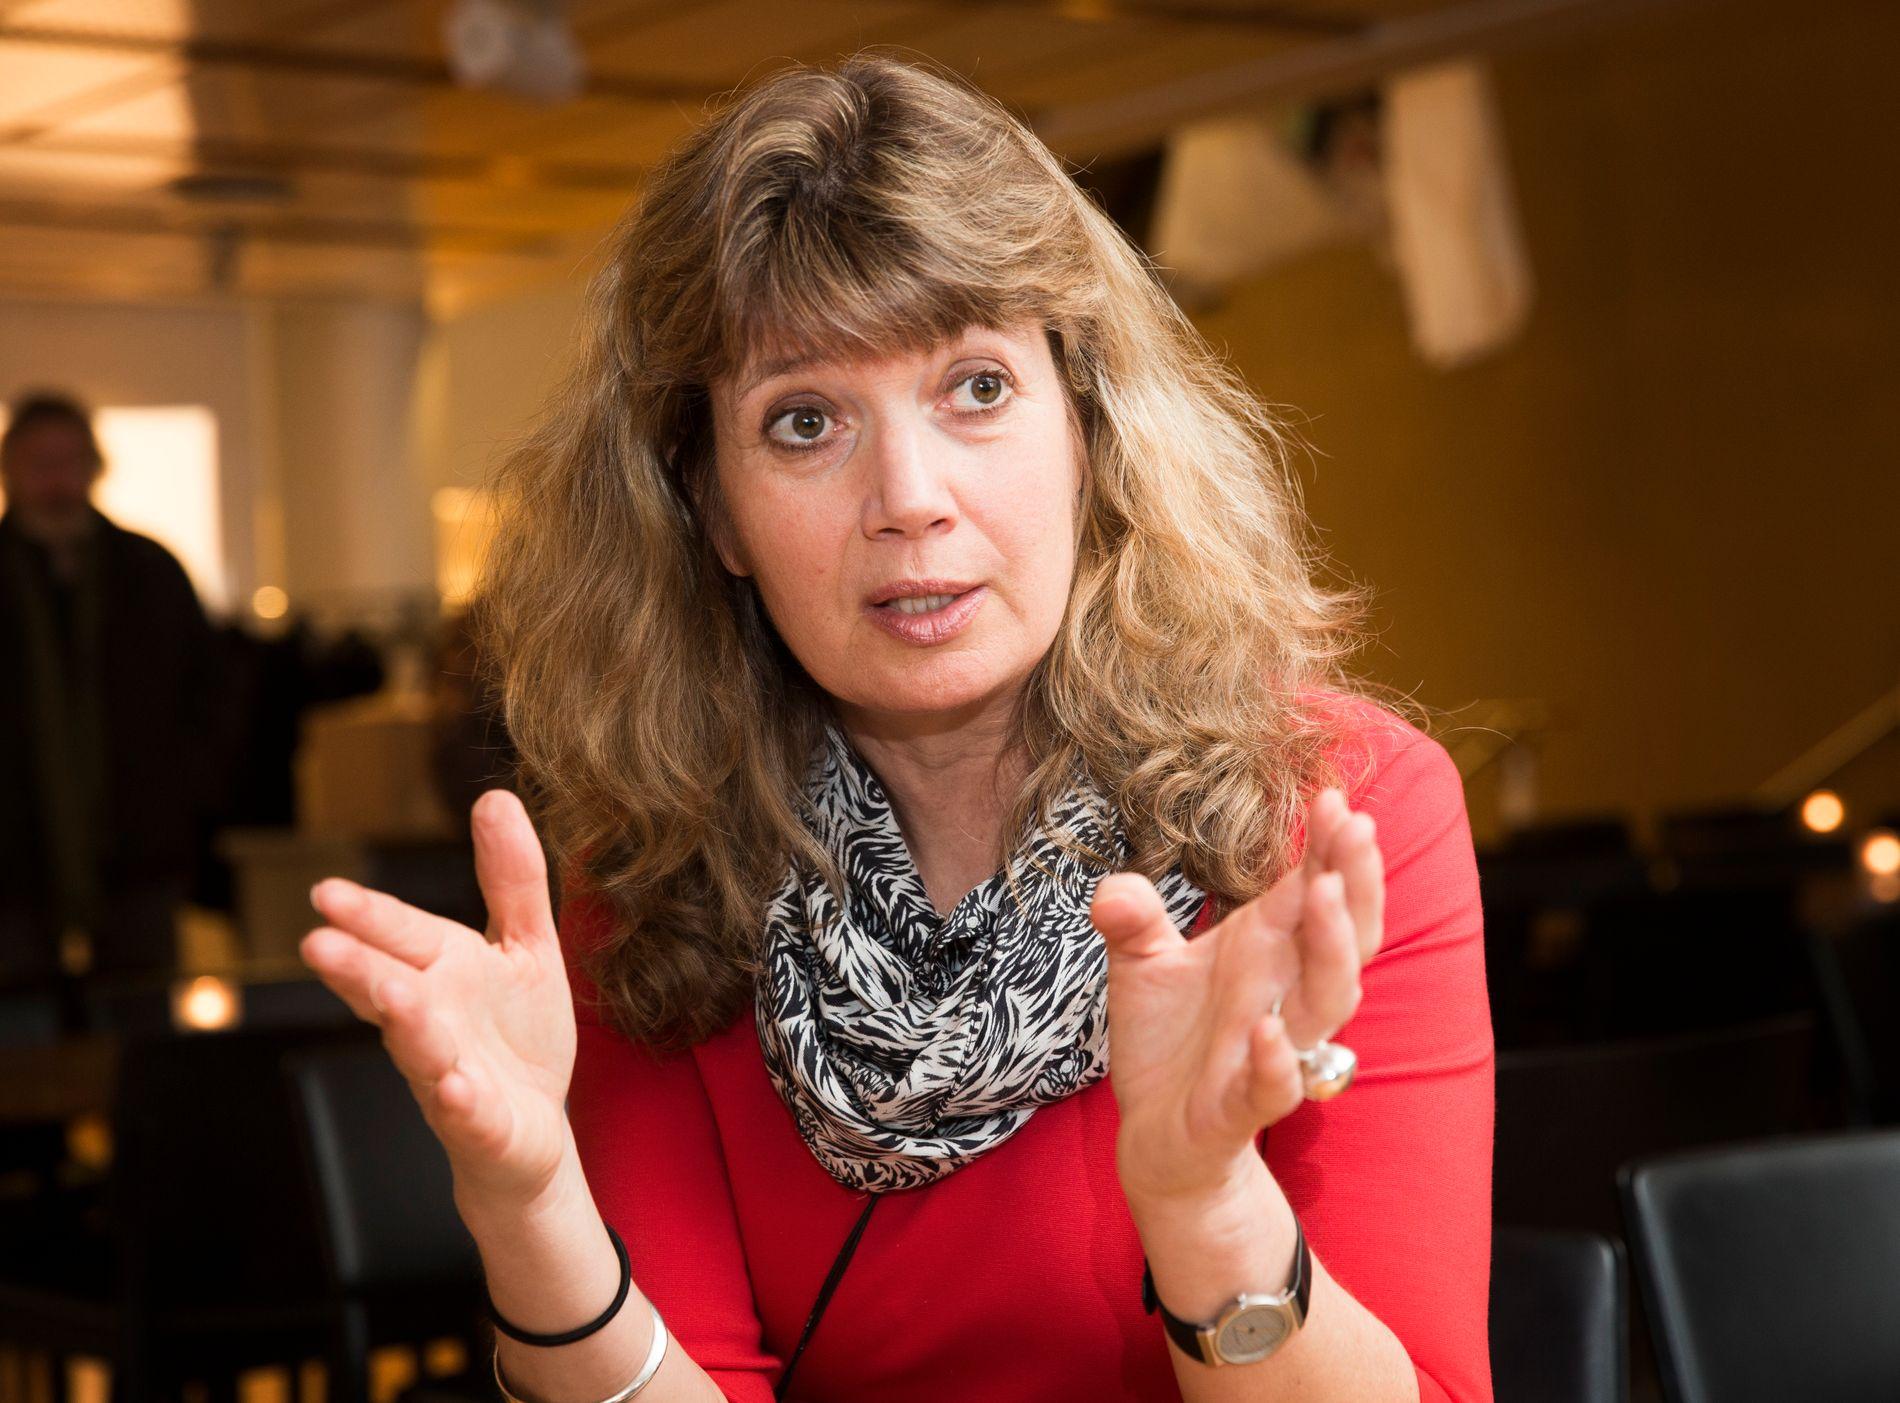 FORNØYD MED SAMARBEID: Generalsekretær i NOAS, Ann-Magrit Austenå.